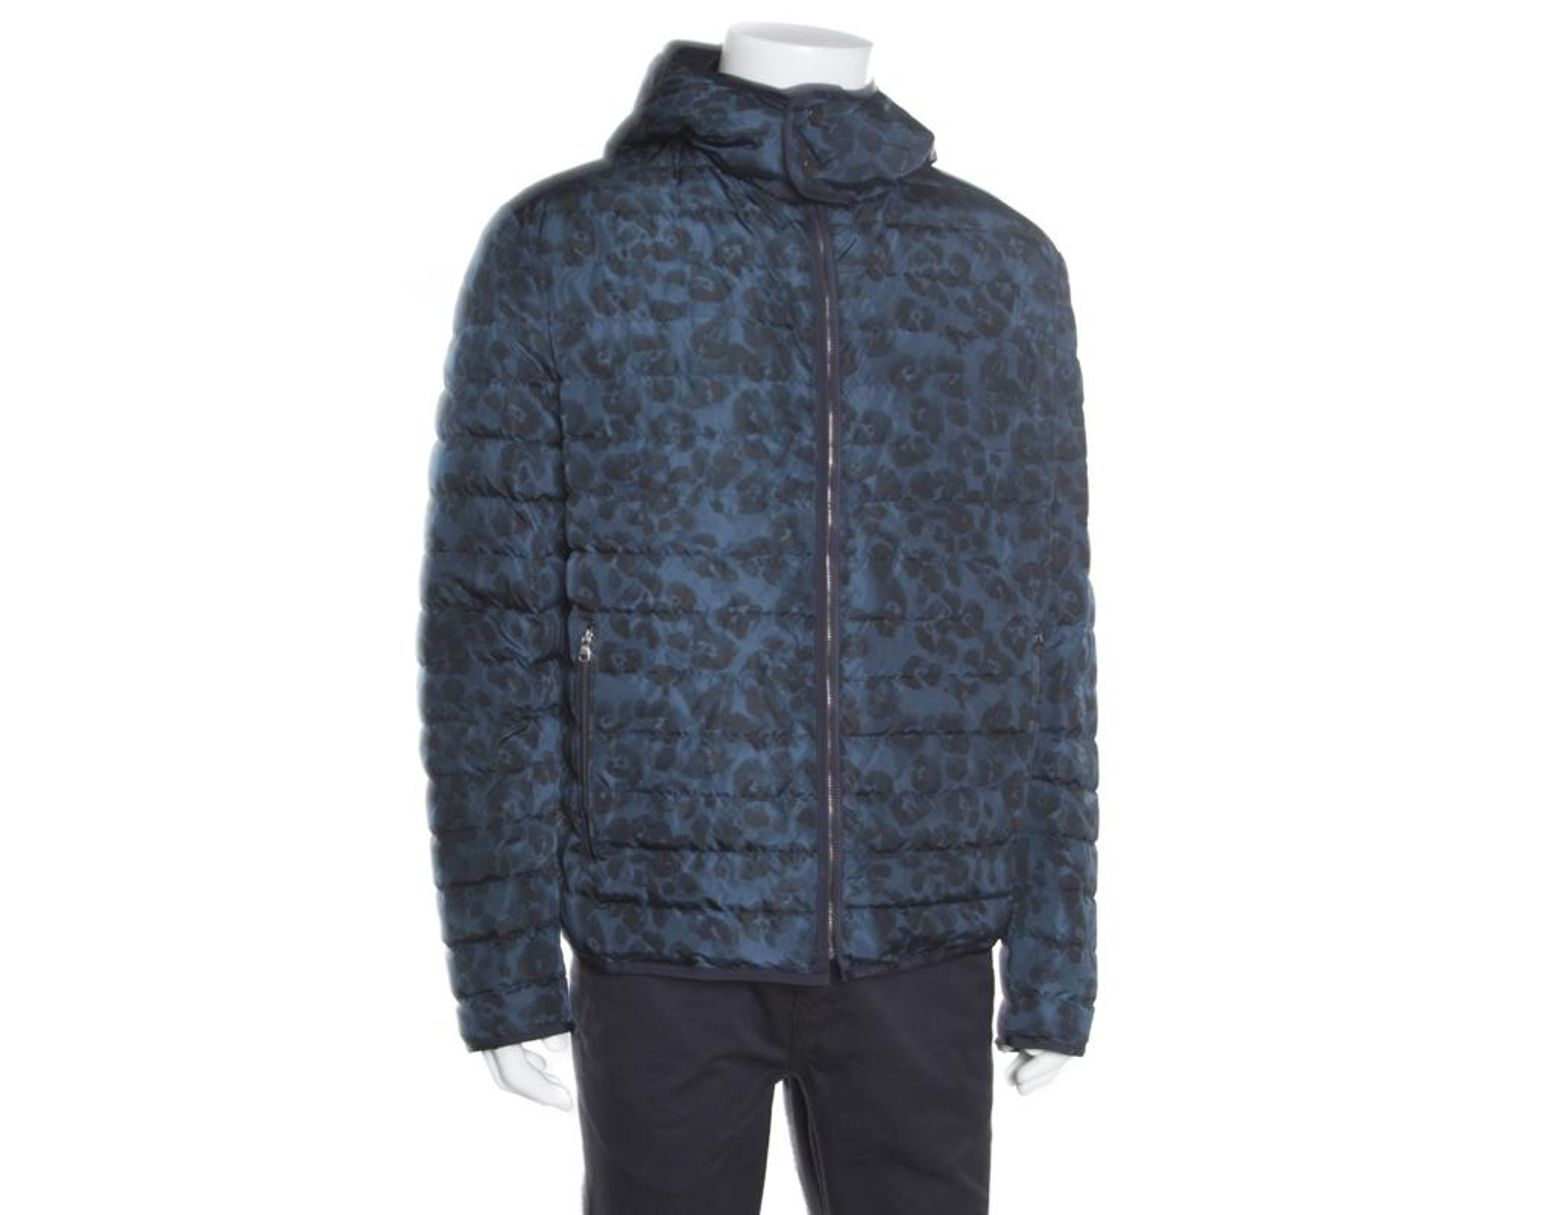 41c1d01c78 Men's Blue Camo Print Hooded Zip Front Quilted Down Jacket Xxl